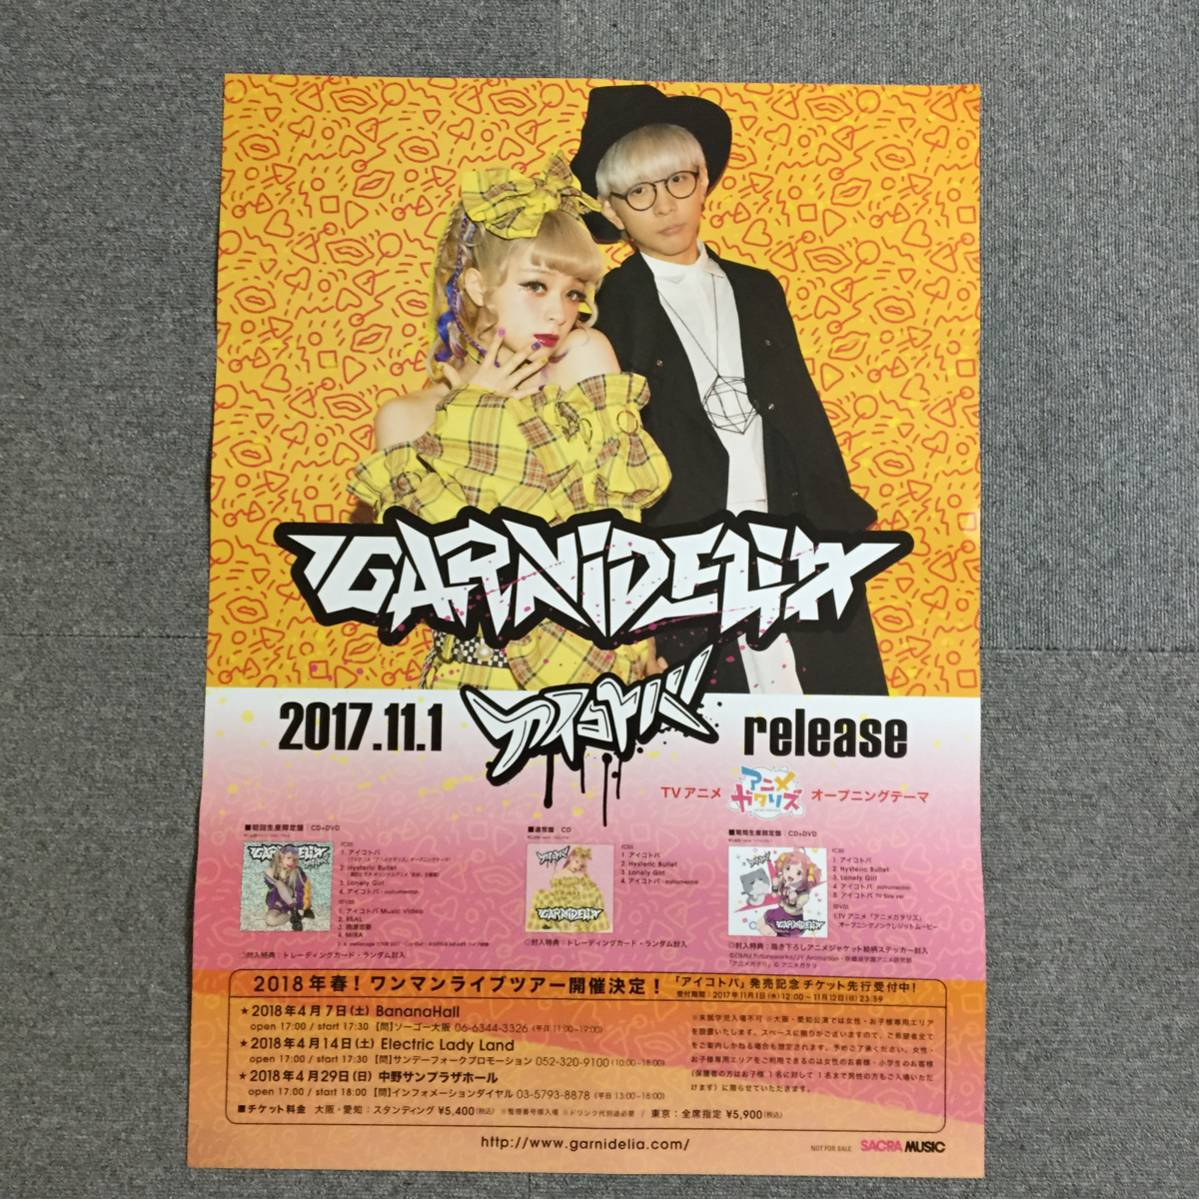 GARNiDELiA アイコトバ ポスター 【傷有り】